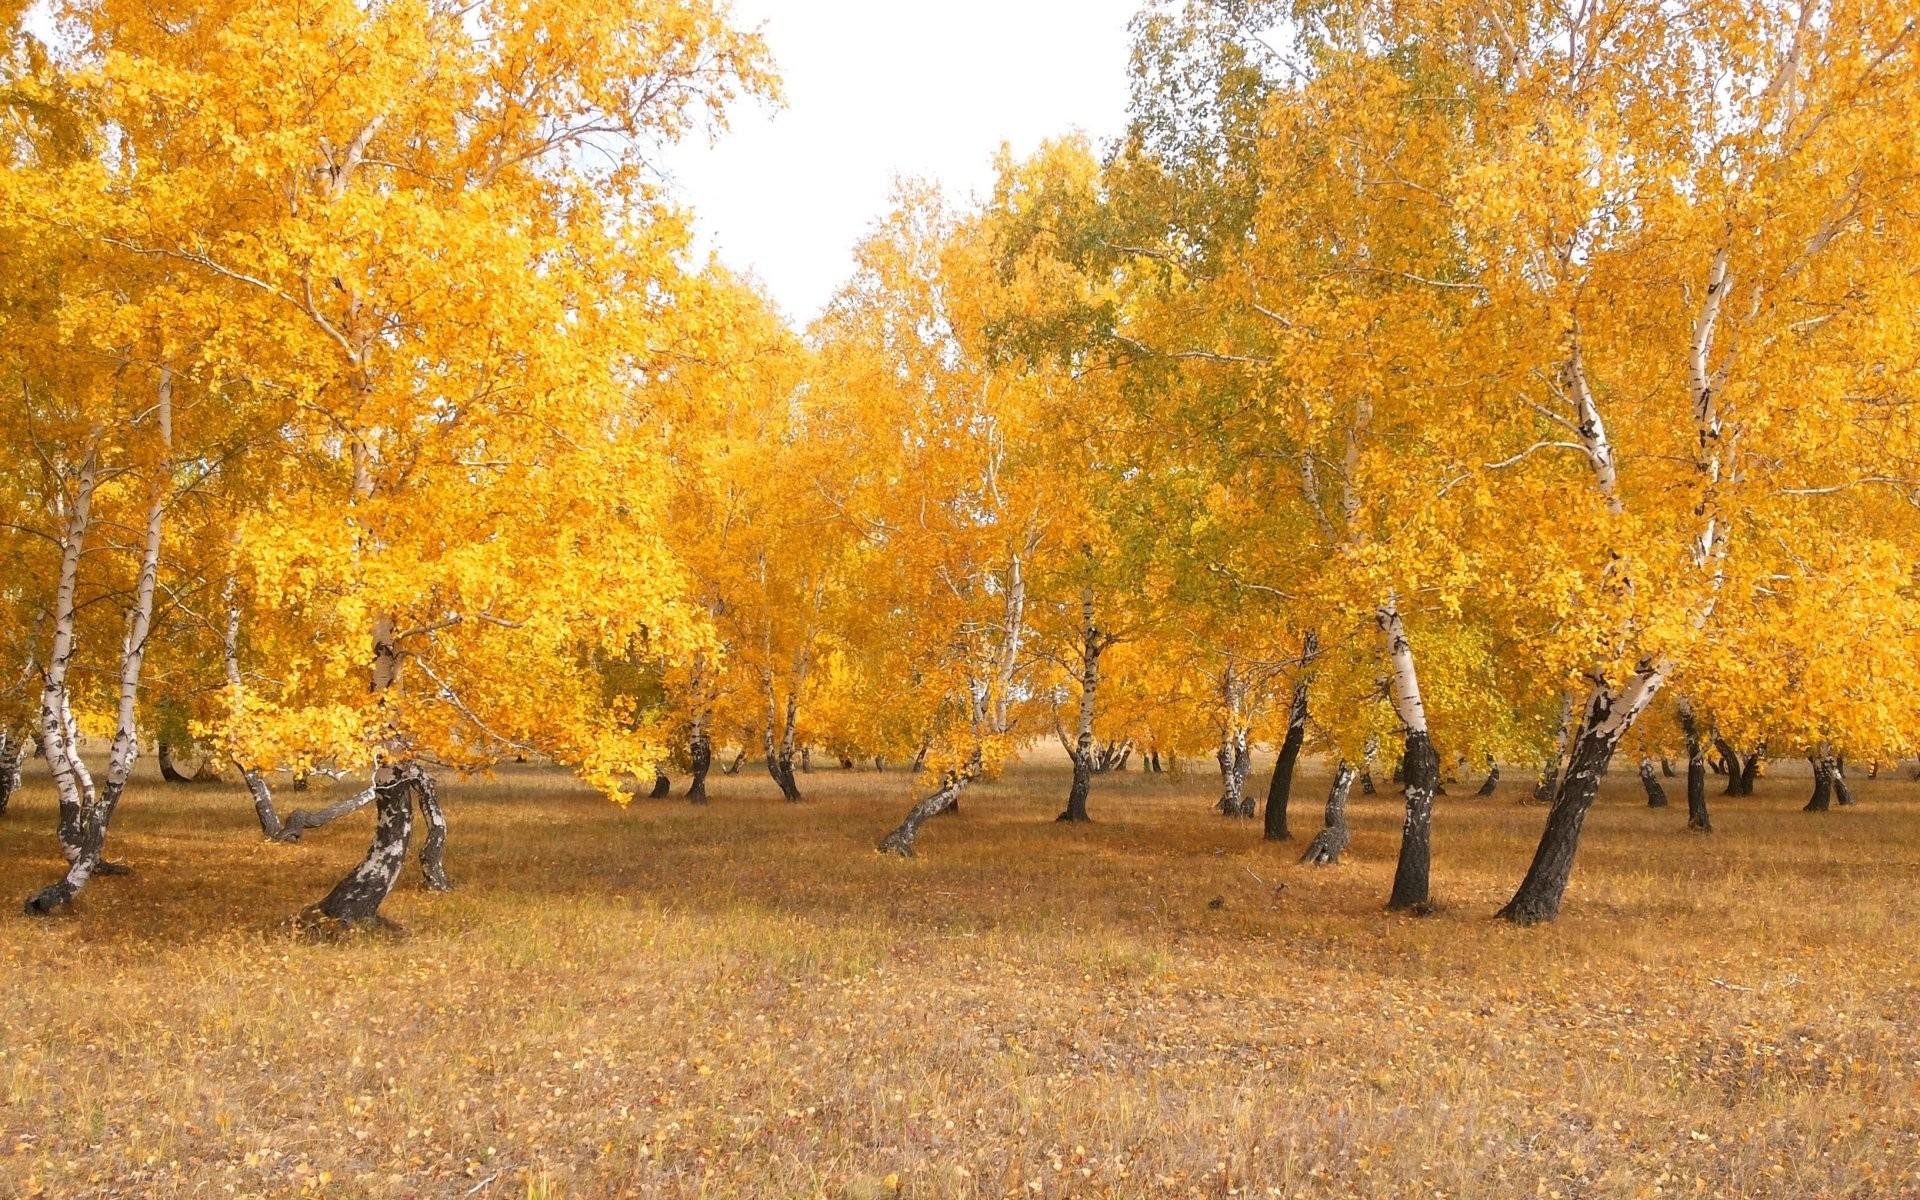 General 1920x1200 trees landscape yellow orange birch fall nature